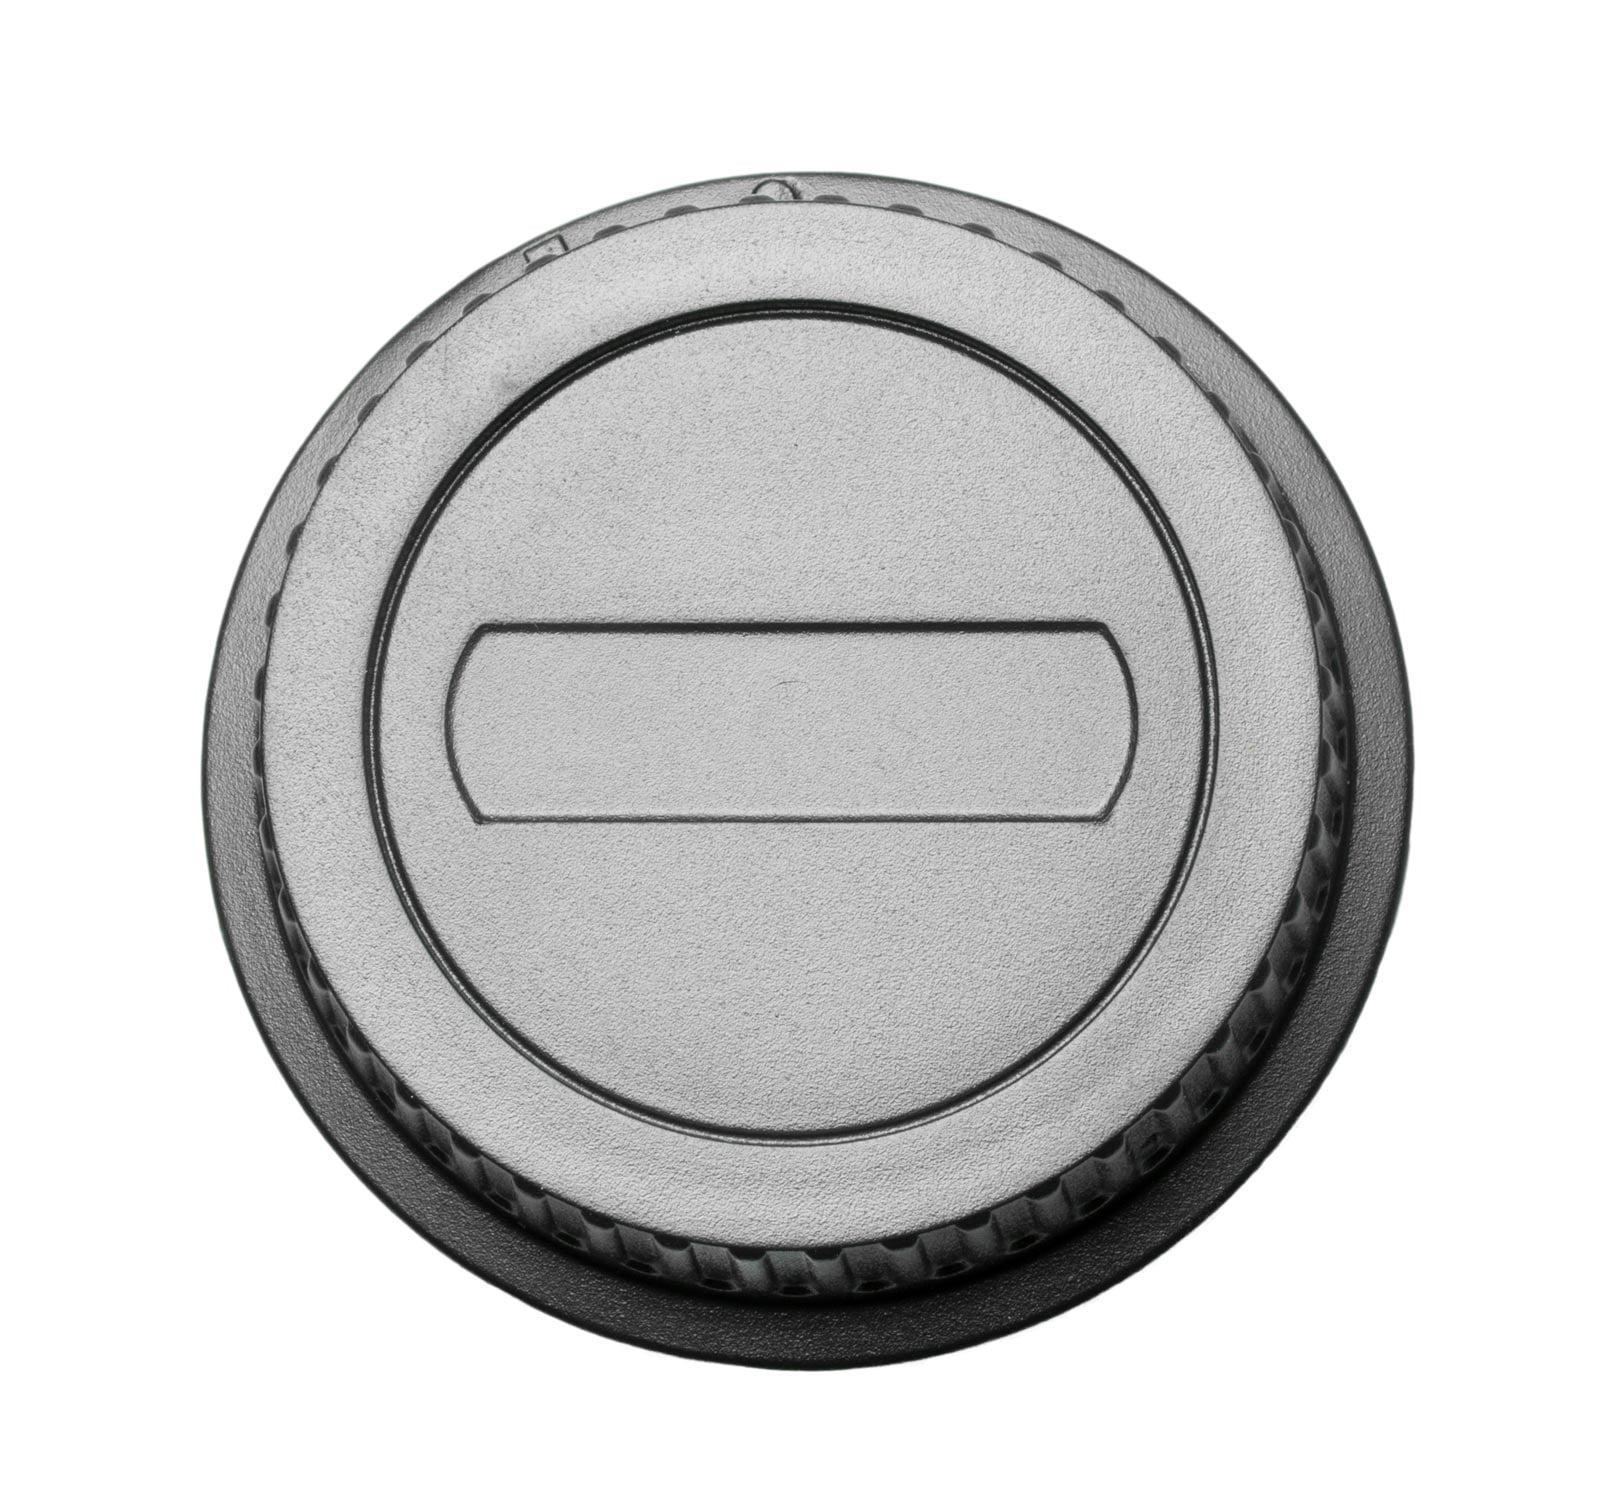 ProMaster Rear Lens Cap  Sony / MAXXUM  Rear Lens Cap